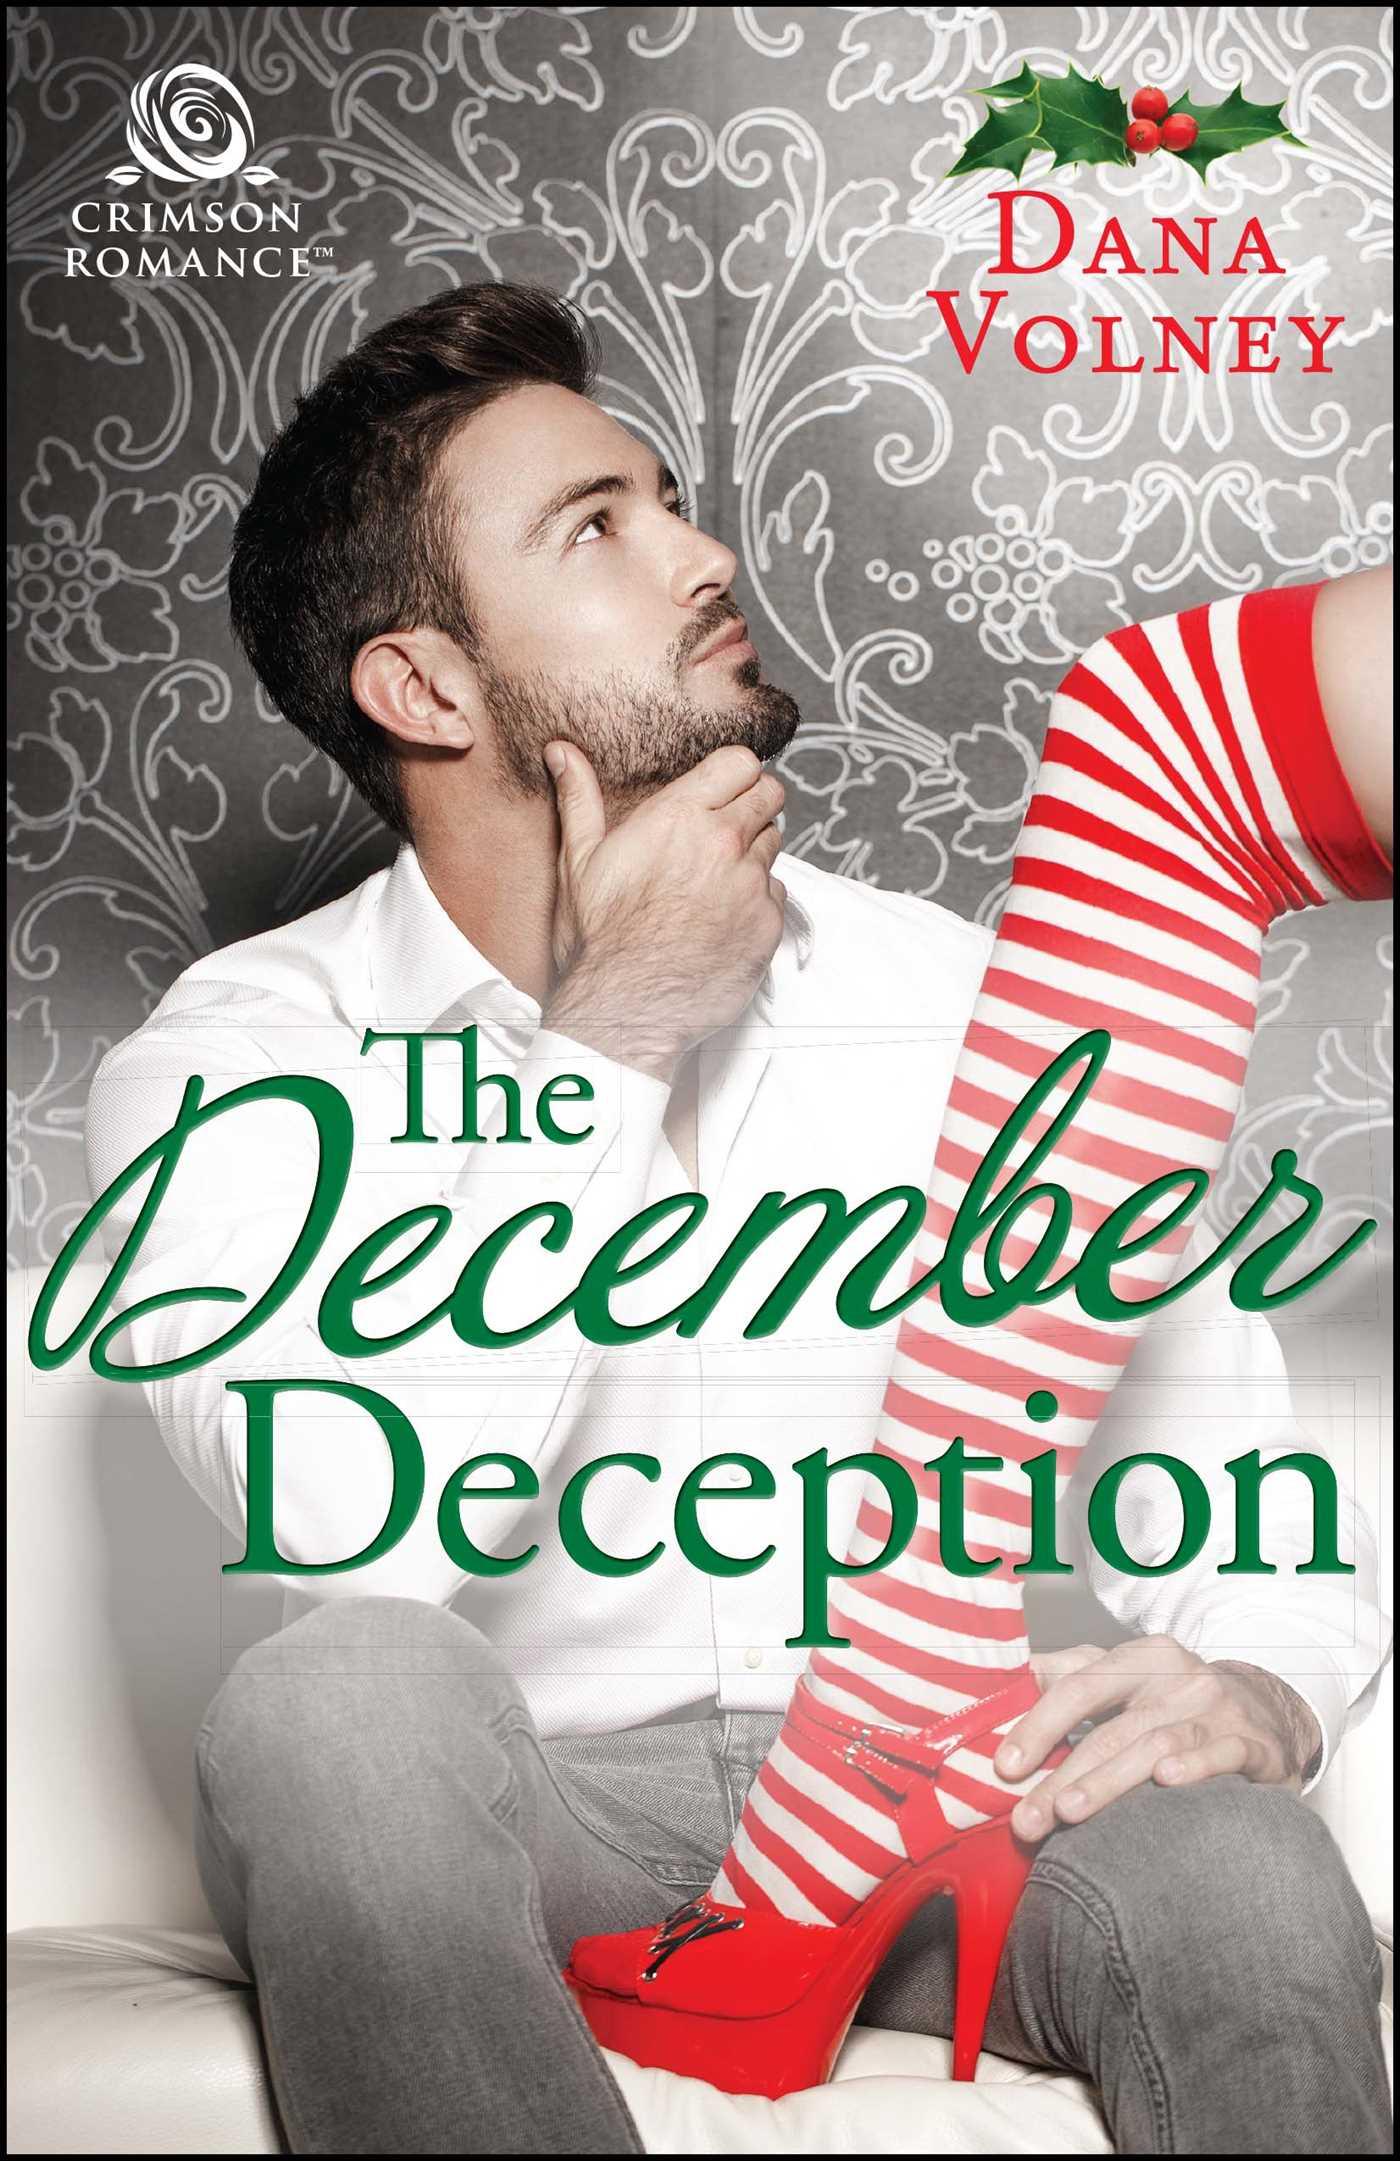 The december deception 9781507207345 hr